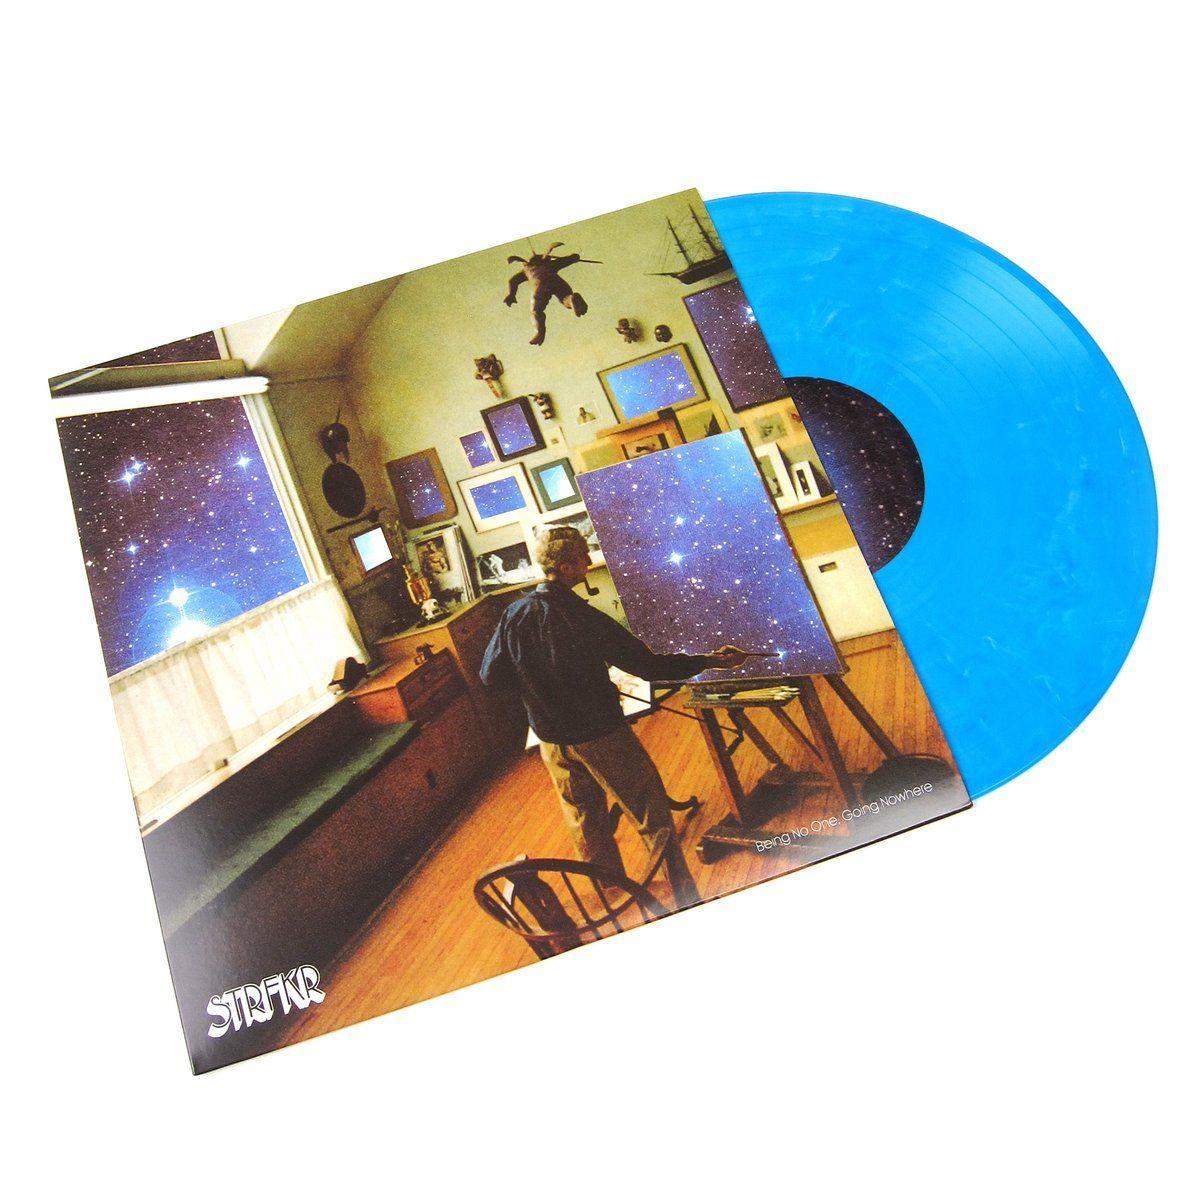 Strfkr Being No One Going Nowhere 180g Colored Vinyl Vinyl Lp In 2020 Vinyl Color Better Music